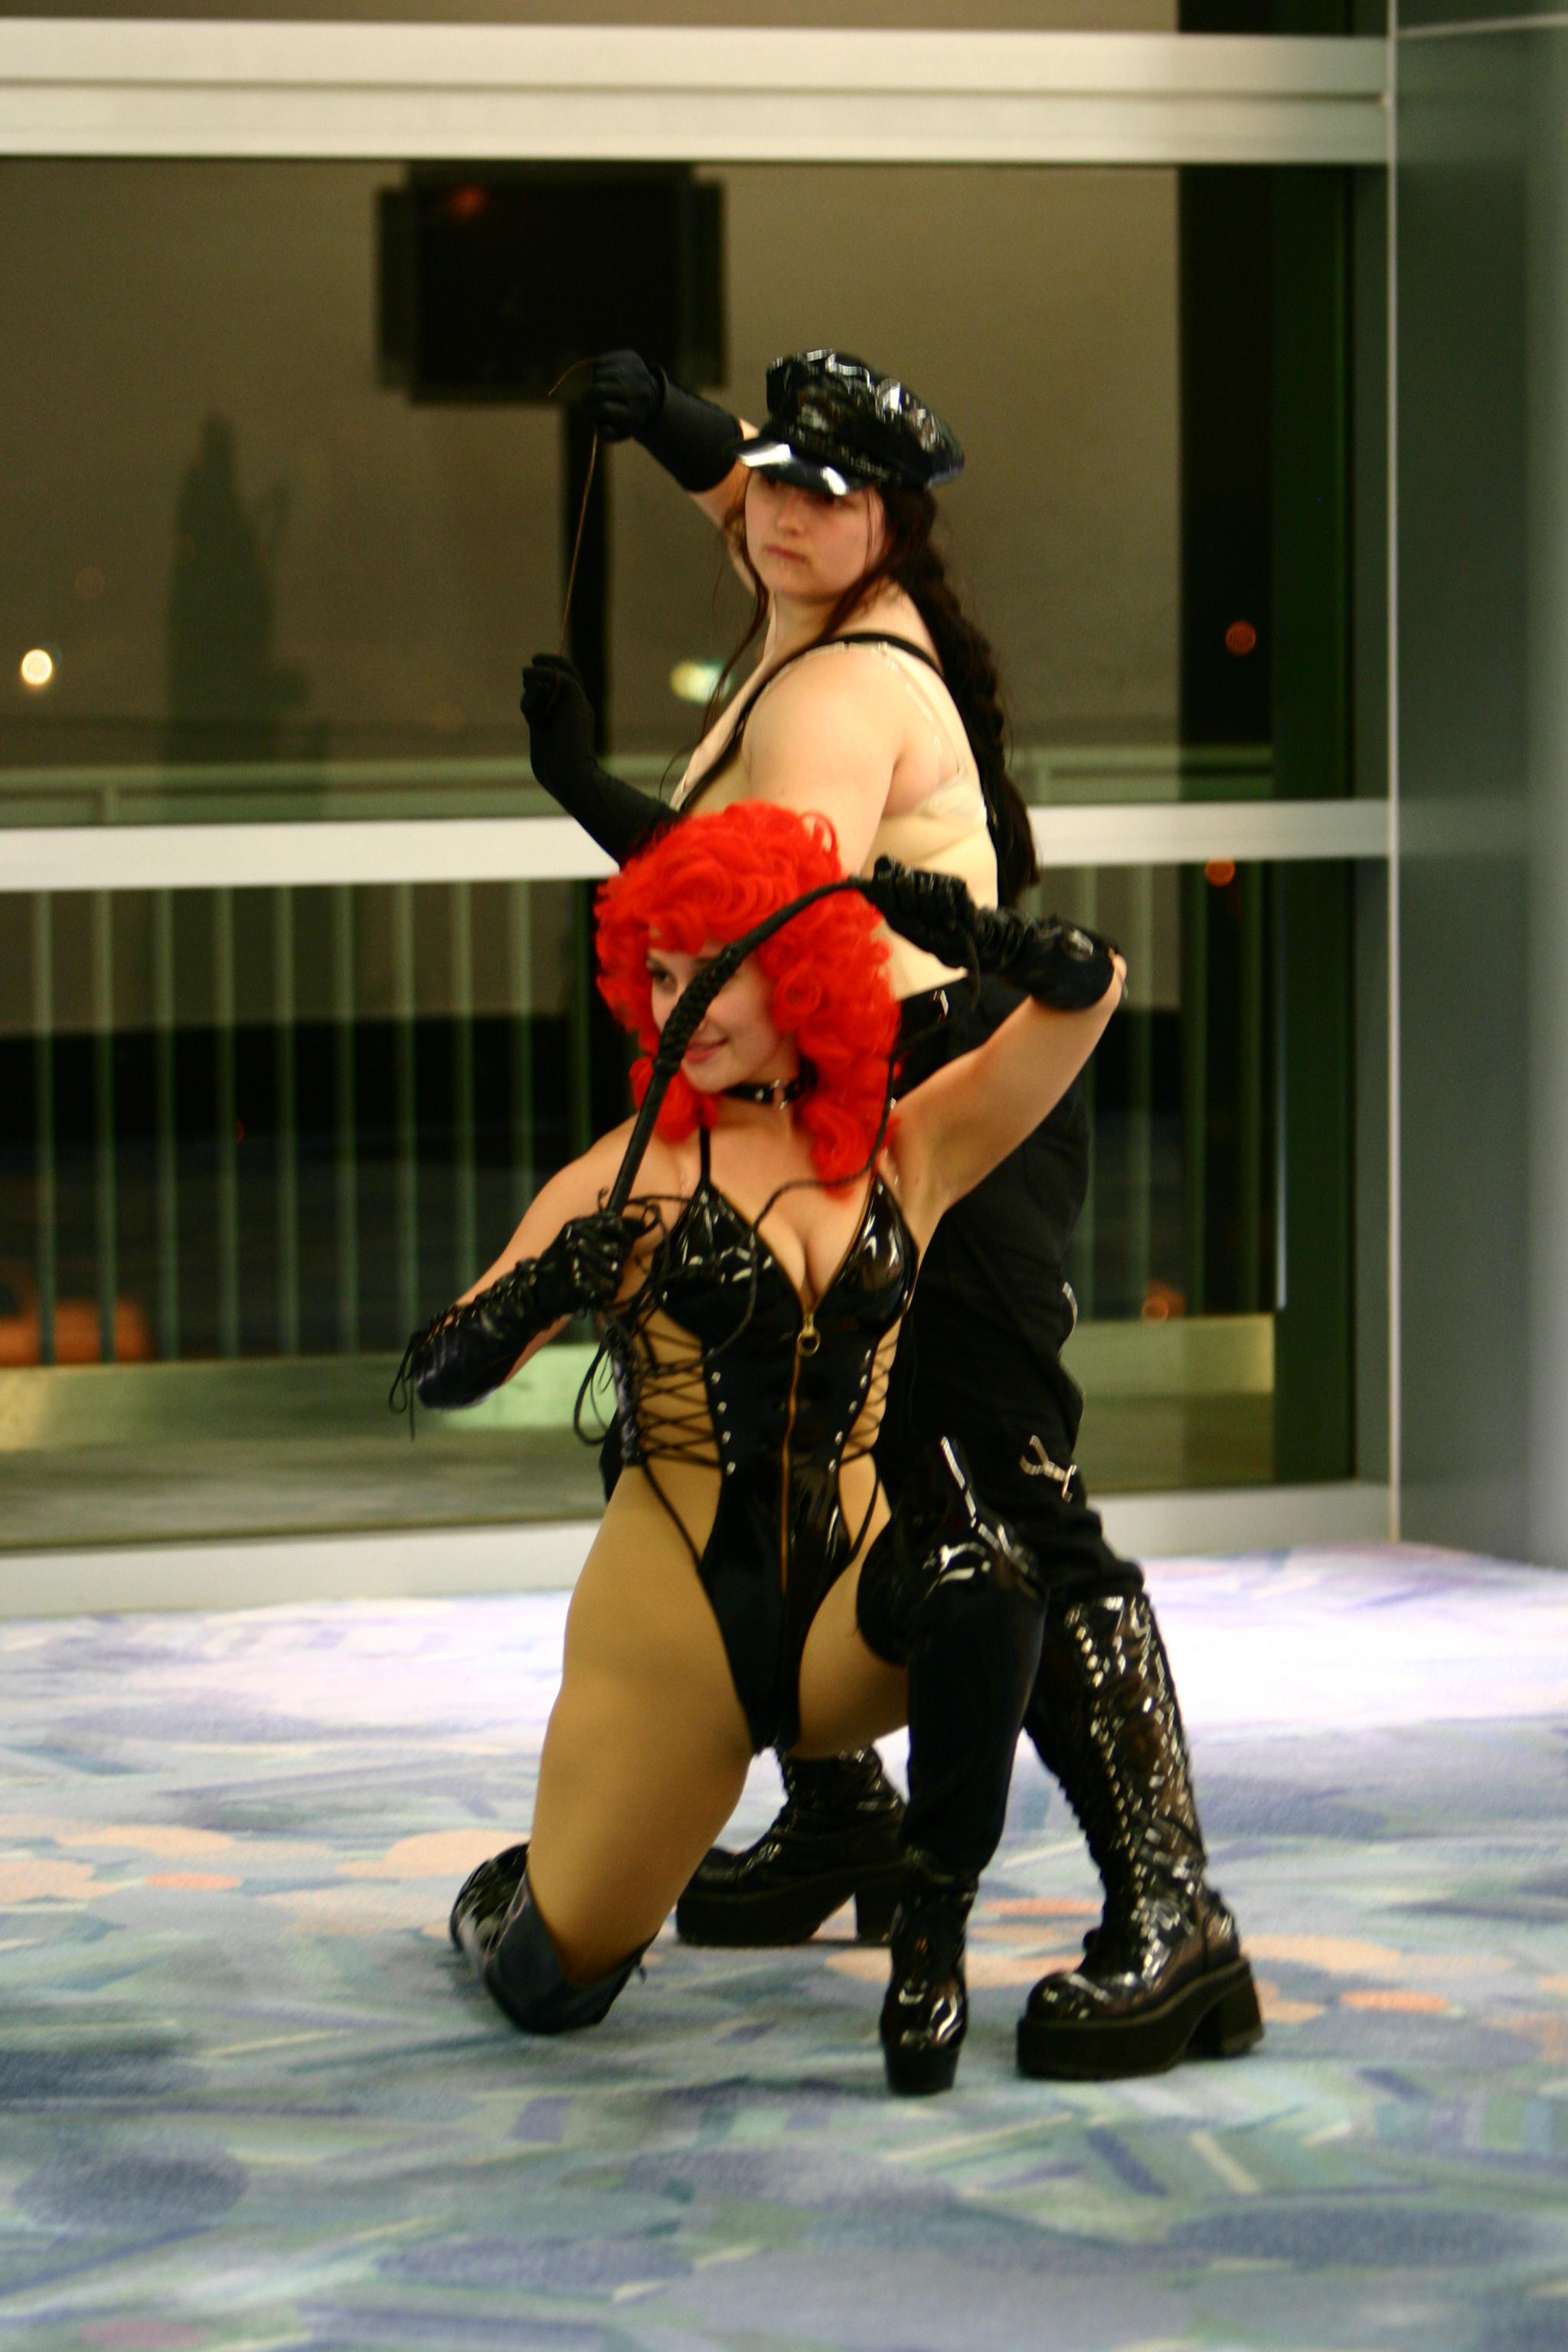 AX_2006_Masquerade_246.JPG